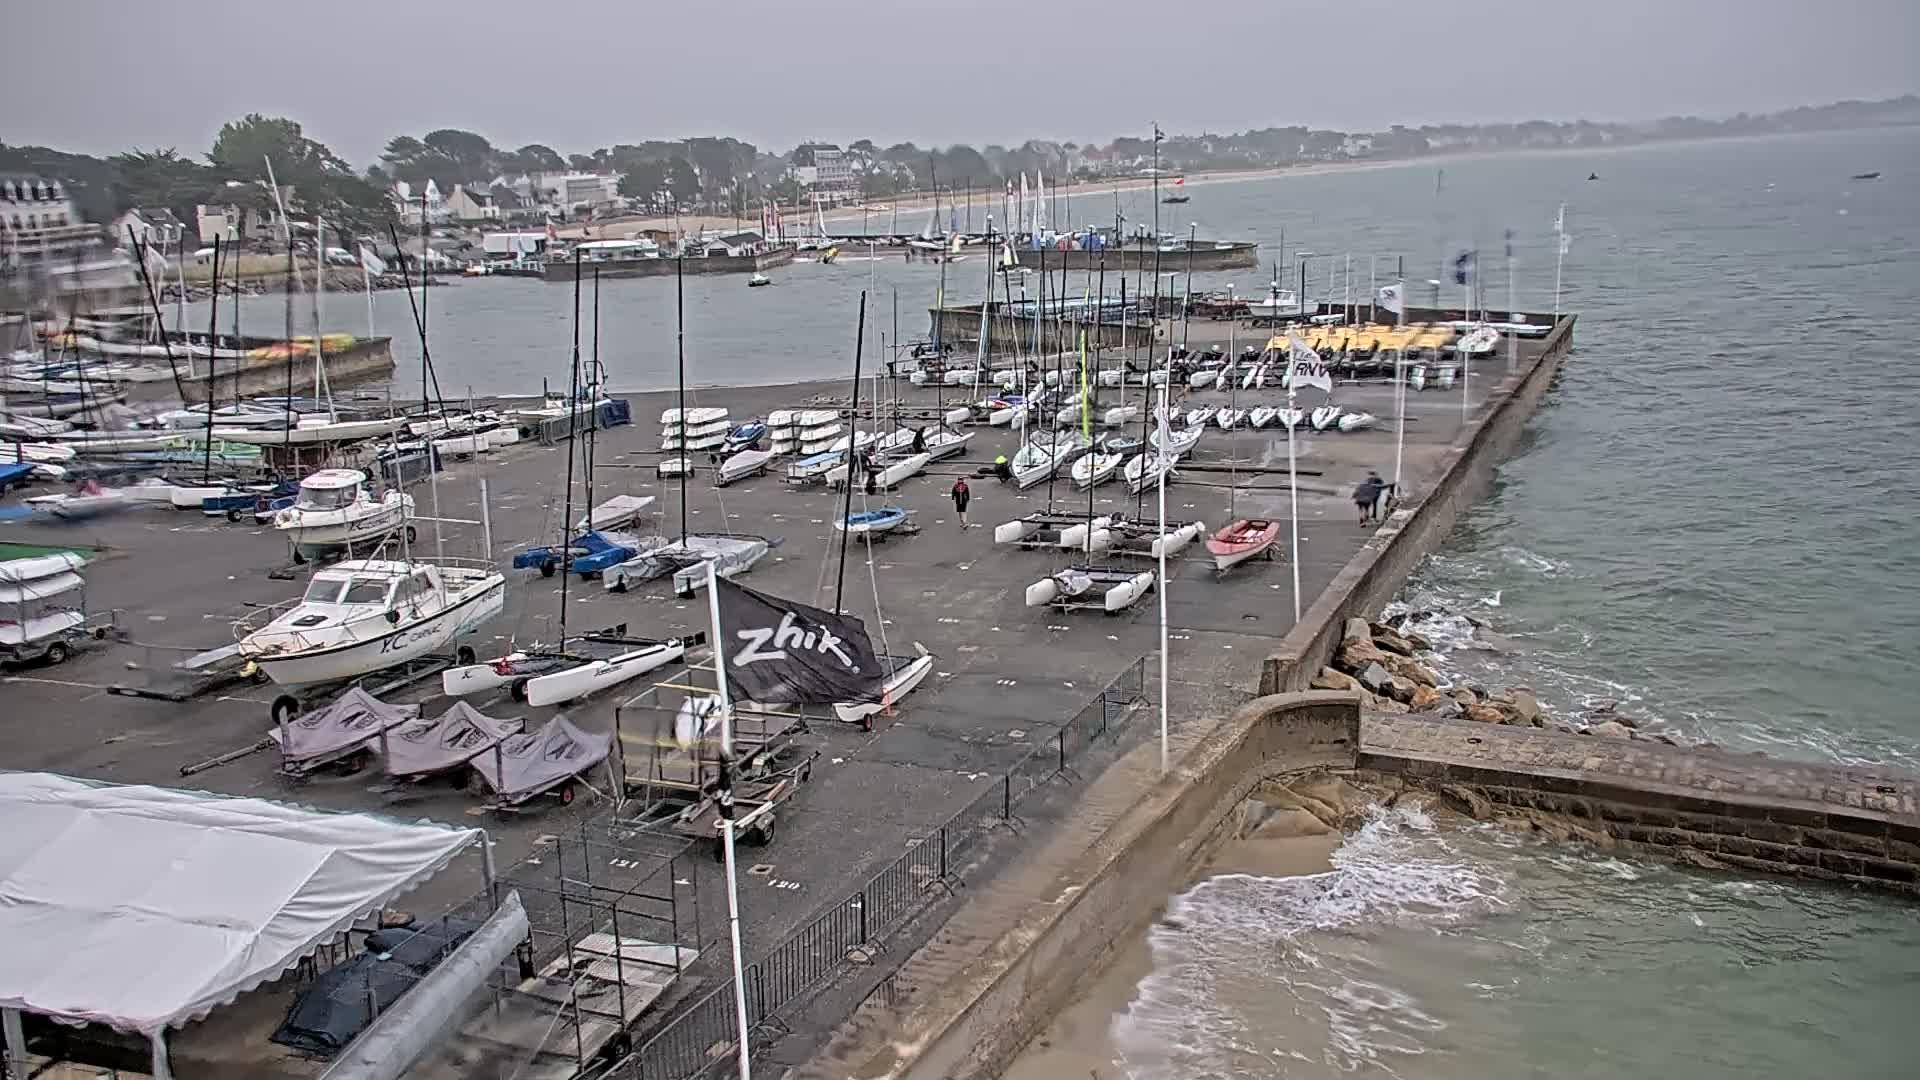 carnac plage webcam temse